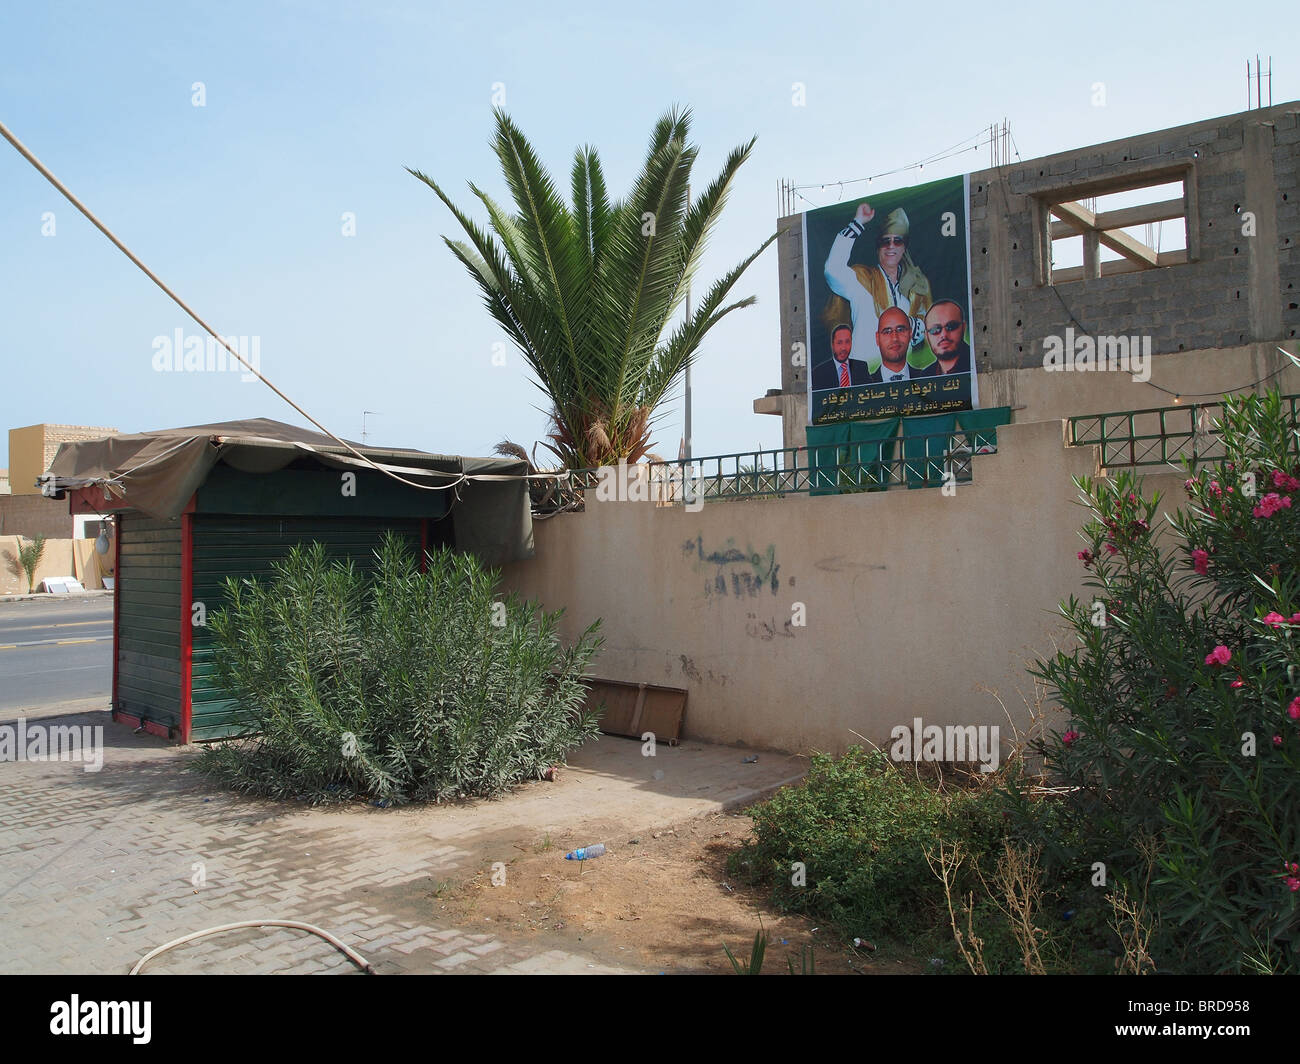 Qaddafi poster and traffic in Tripoli - Stock Image